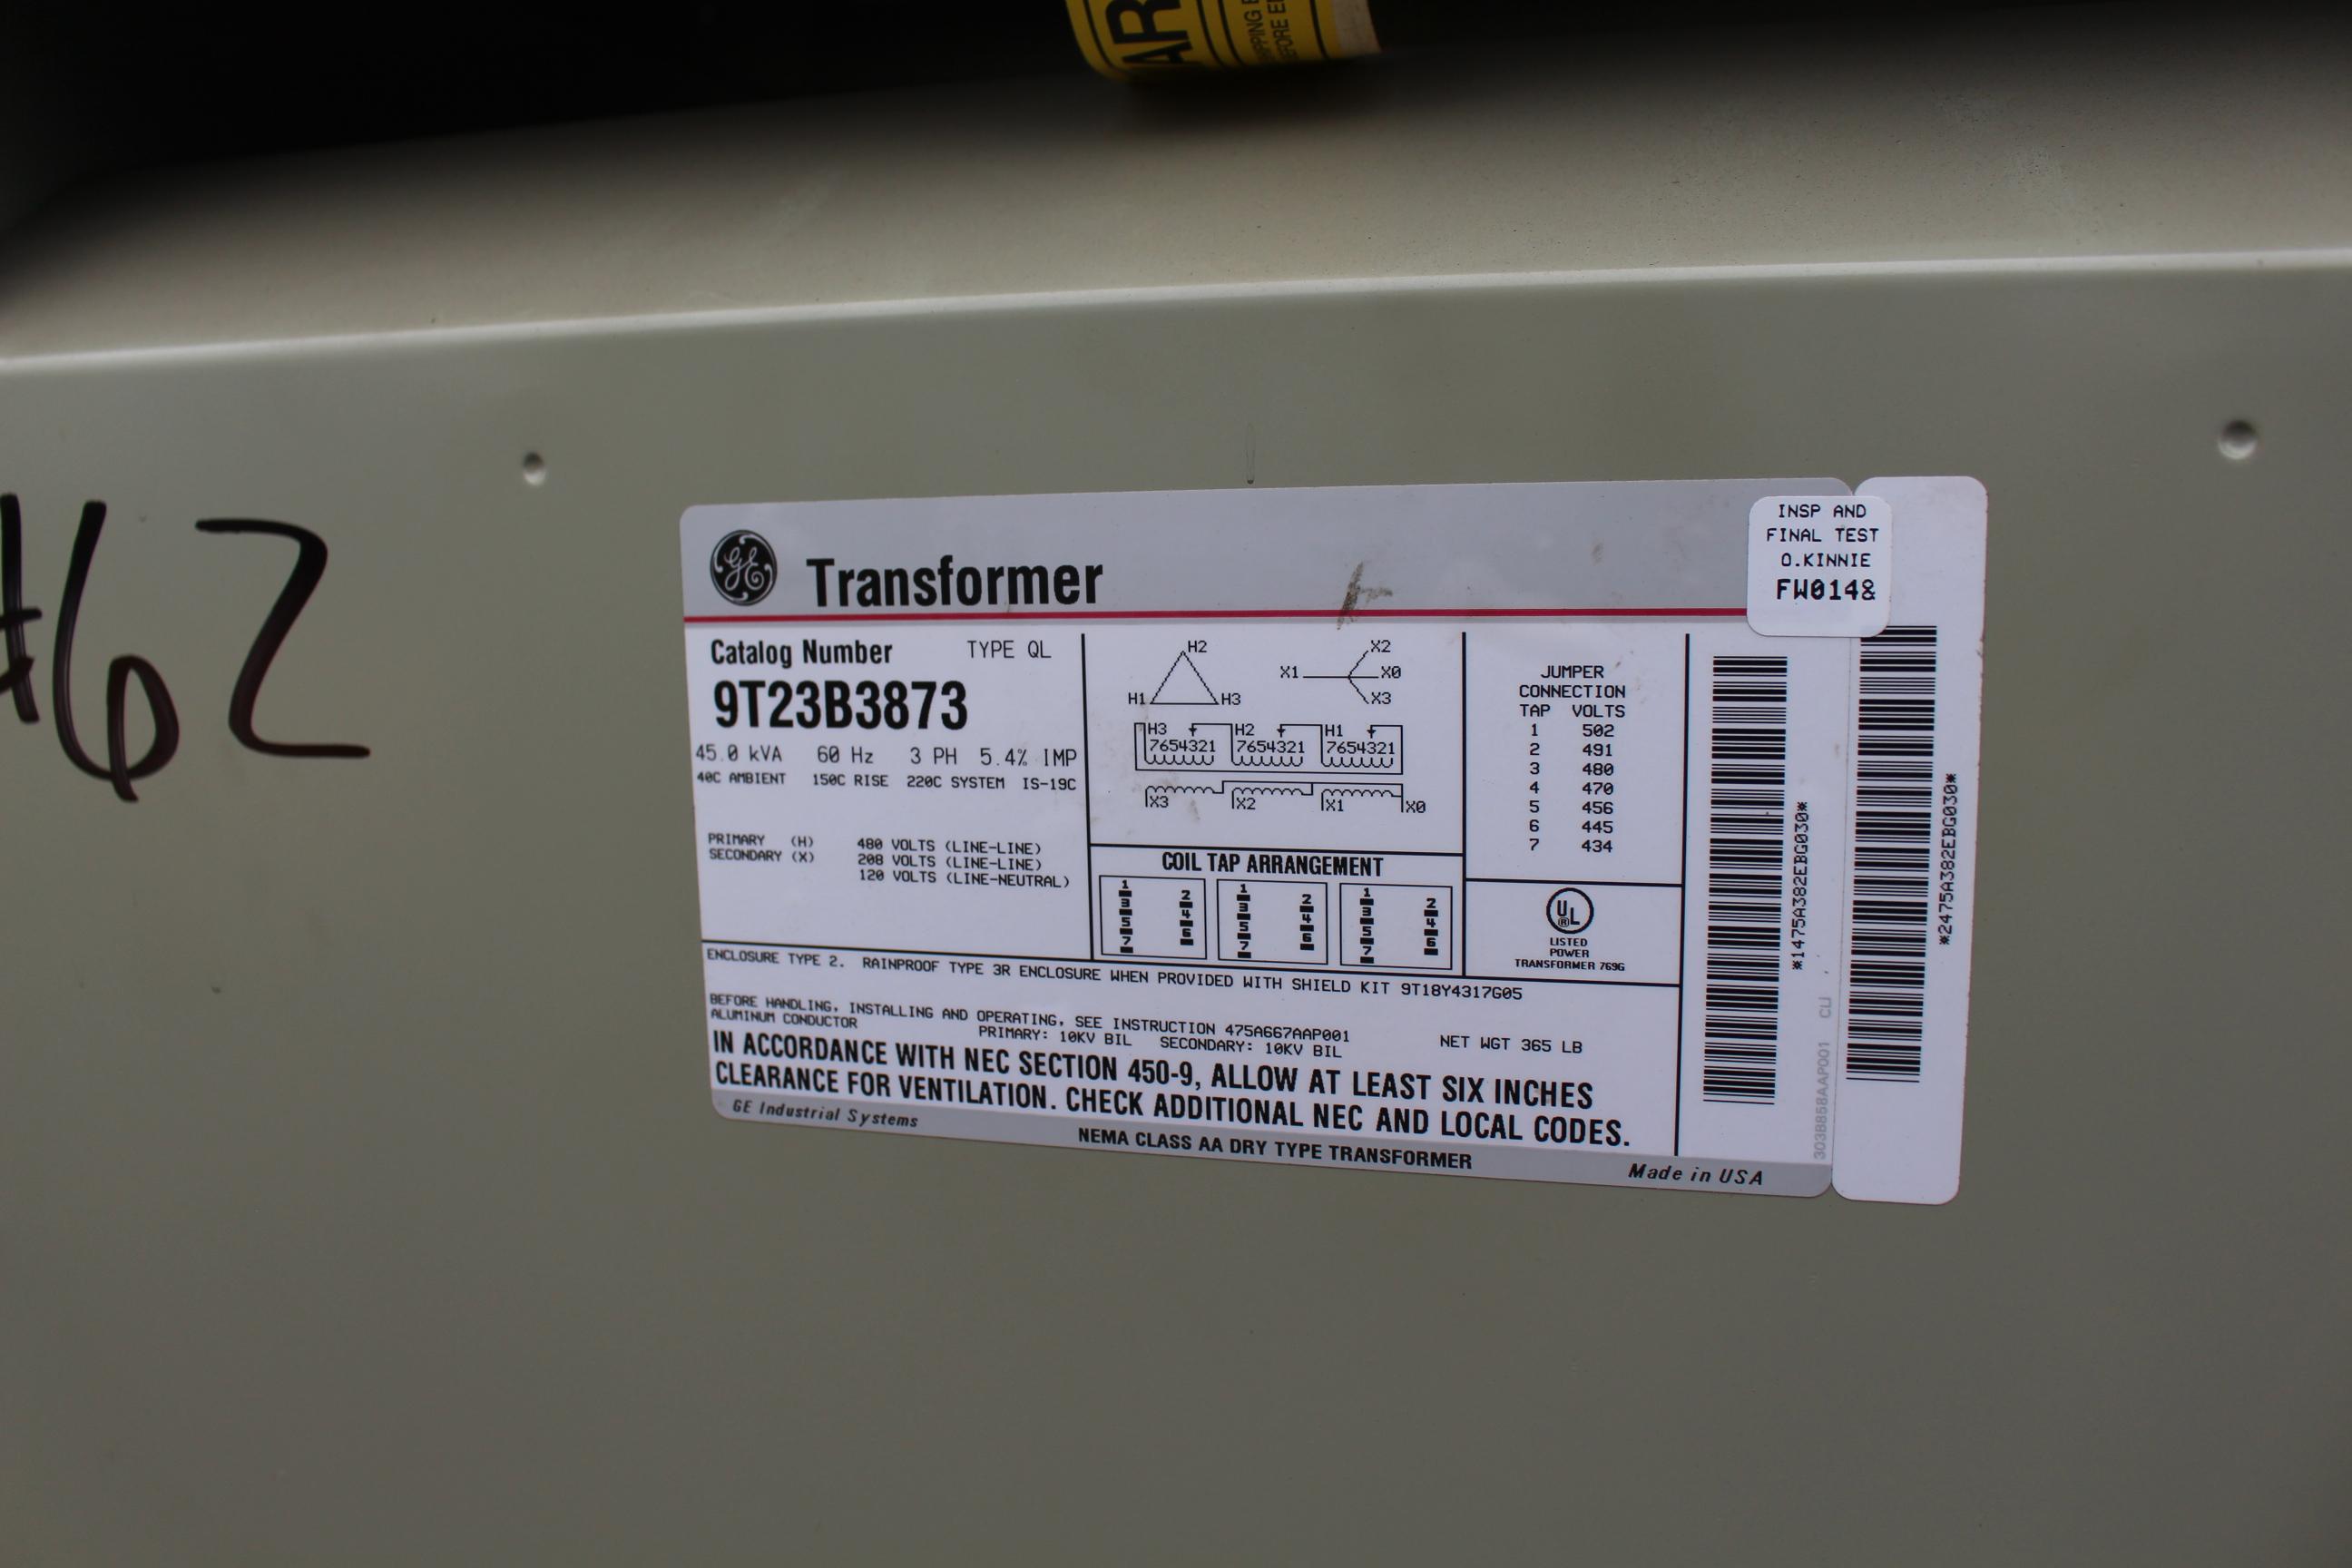 GE TRANSFORMER, 45 KVA - Image 2 of 2